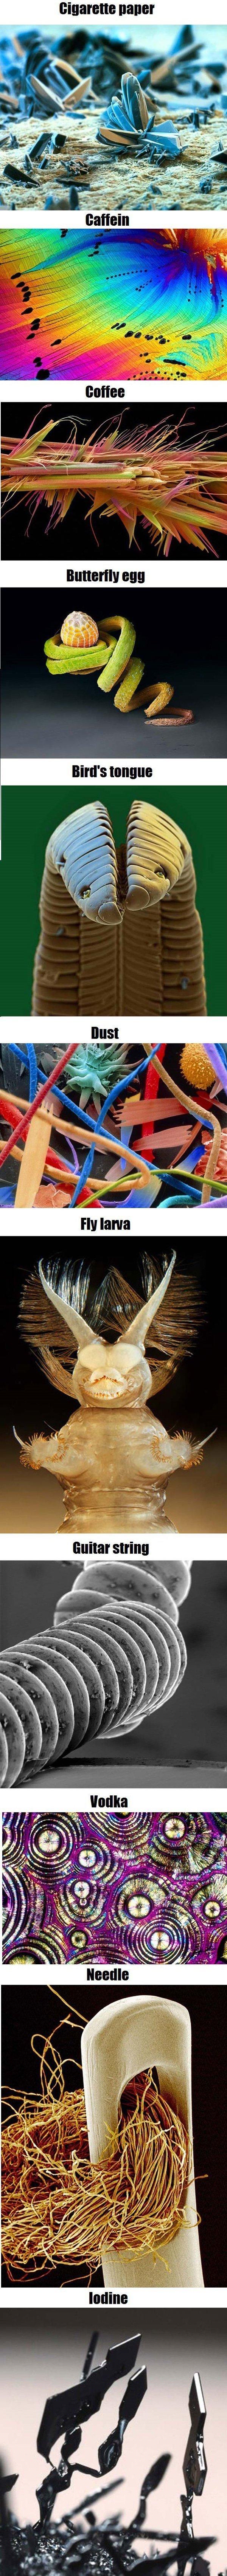 Macro-micro. .. Plot twist, frank was a fly larva the entire time. Macro-micro Plot twist frank was a fly larva the entire time